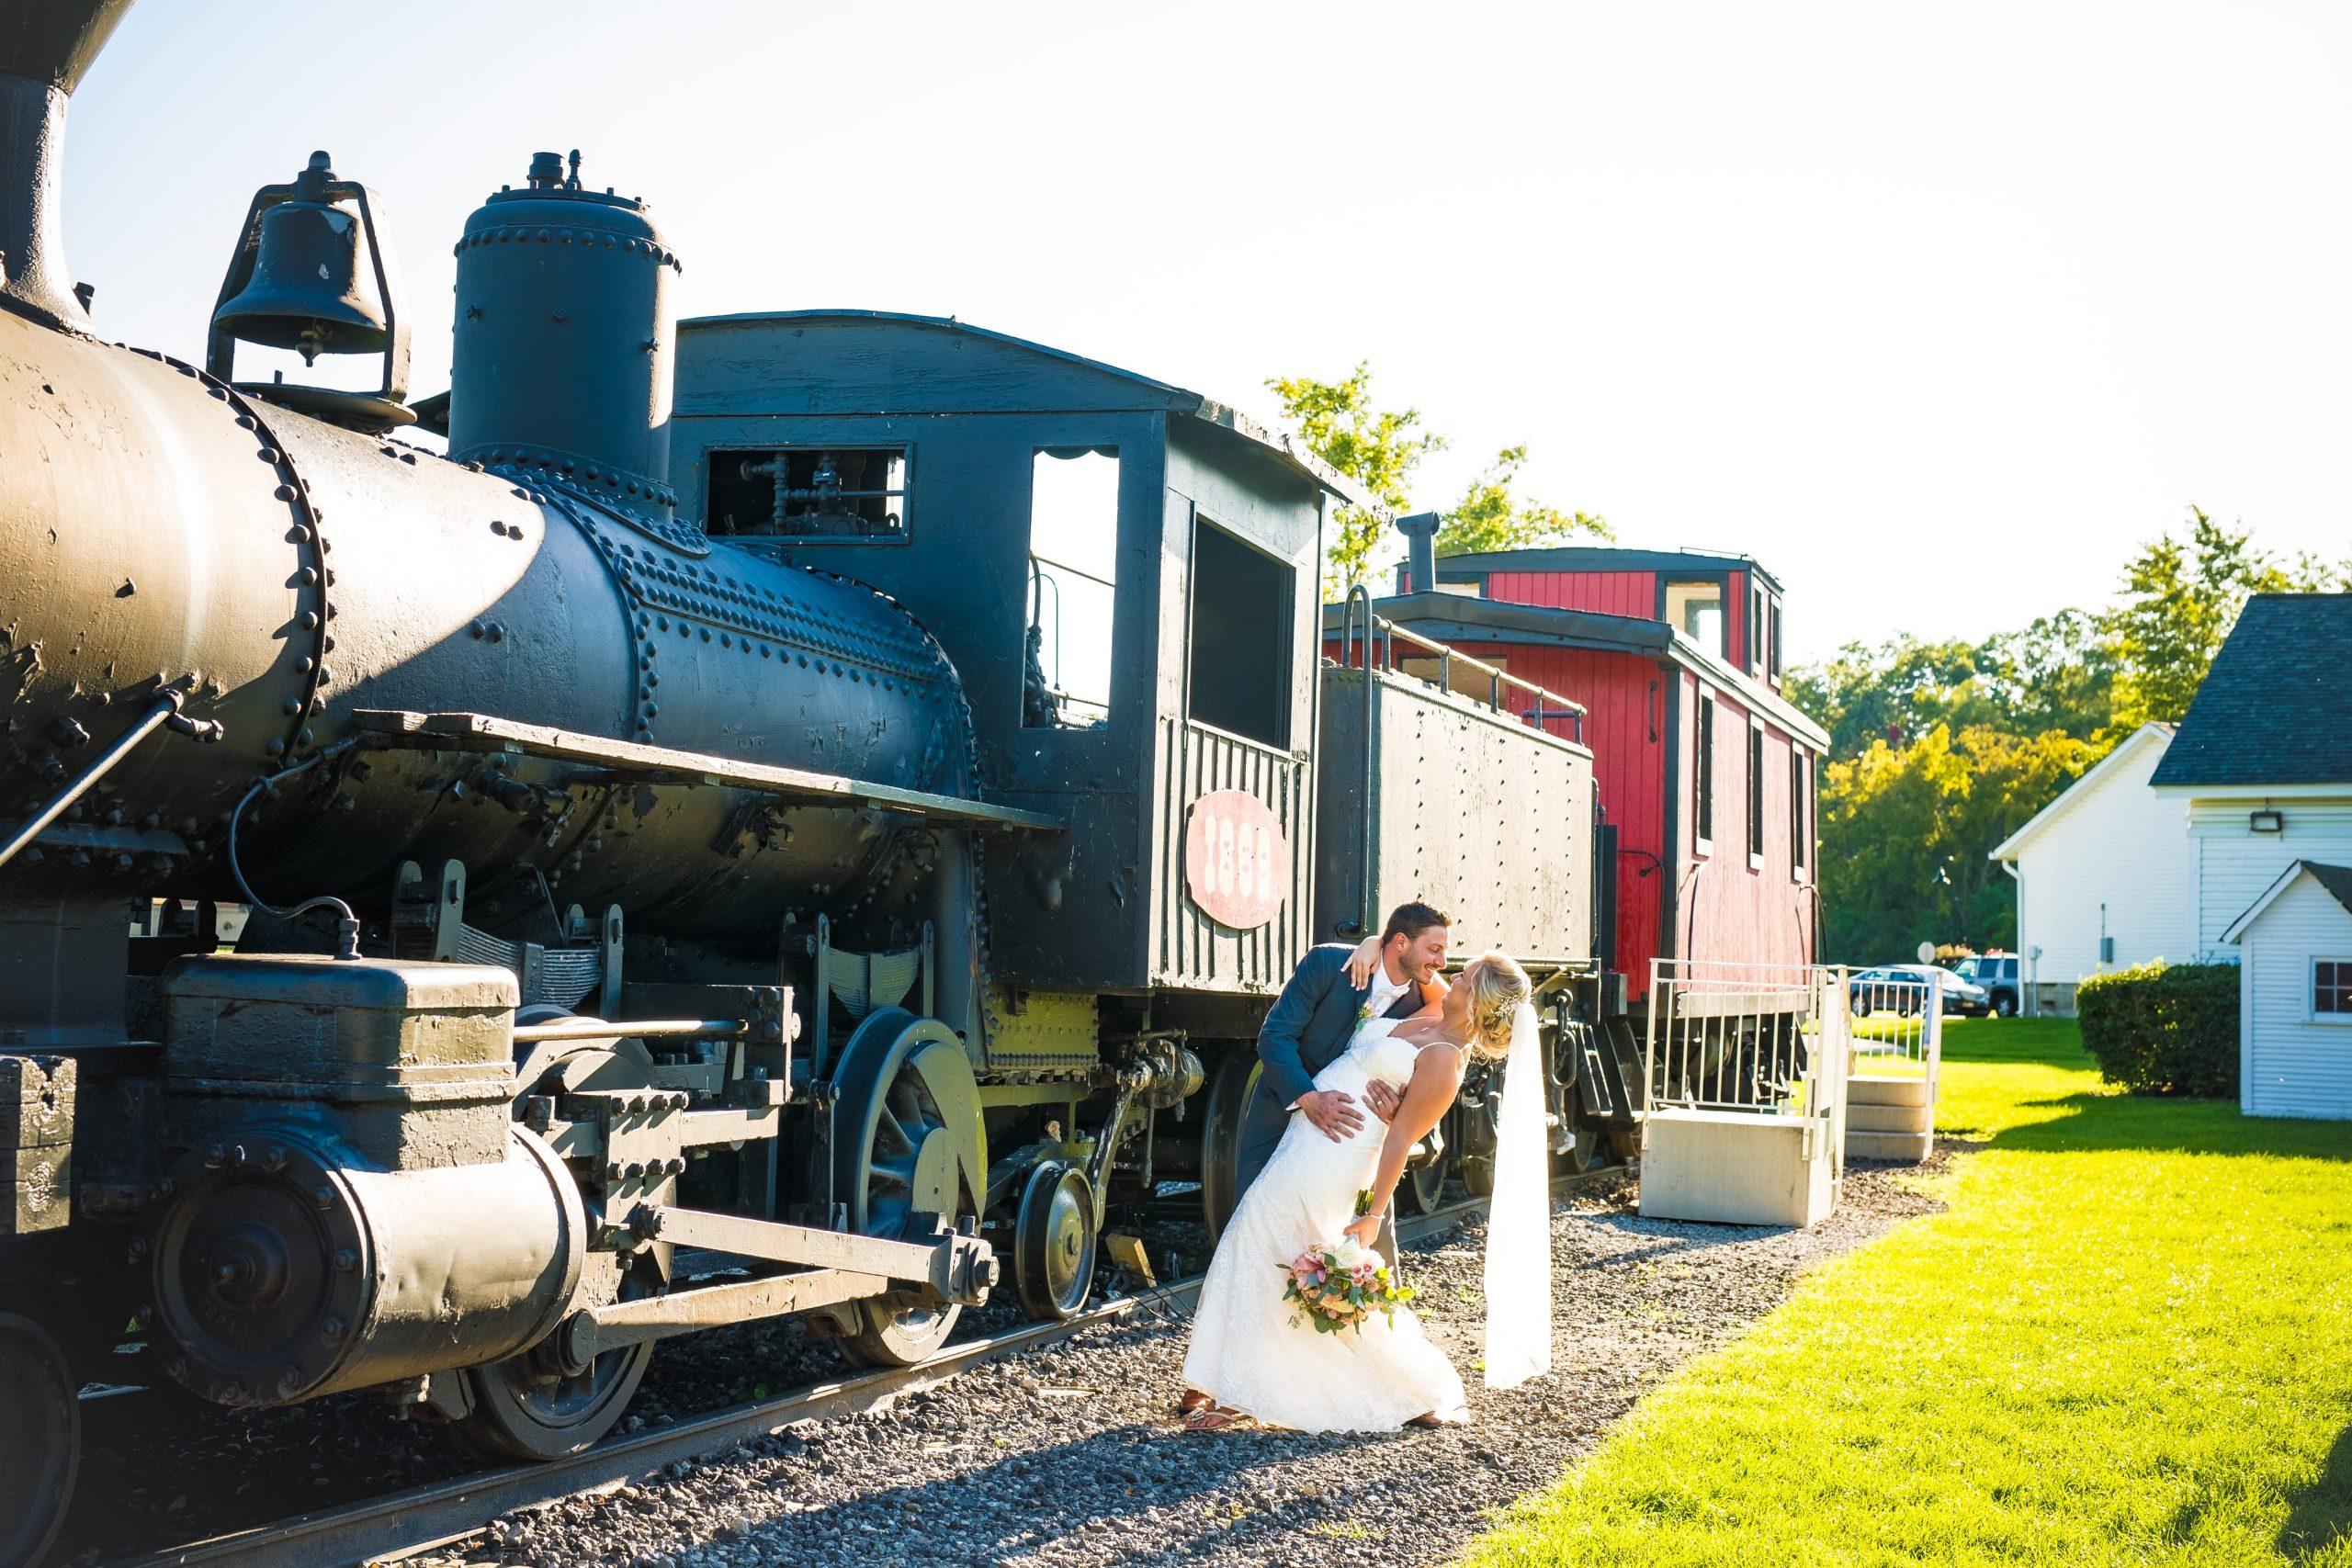 wedding day romantics by a train